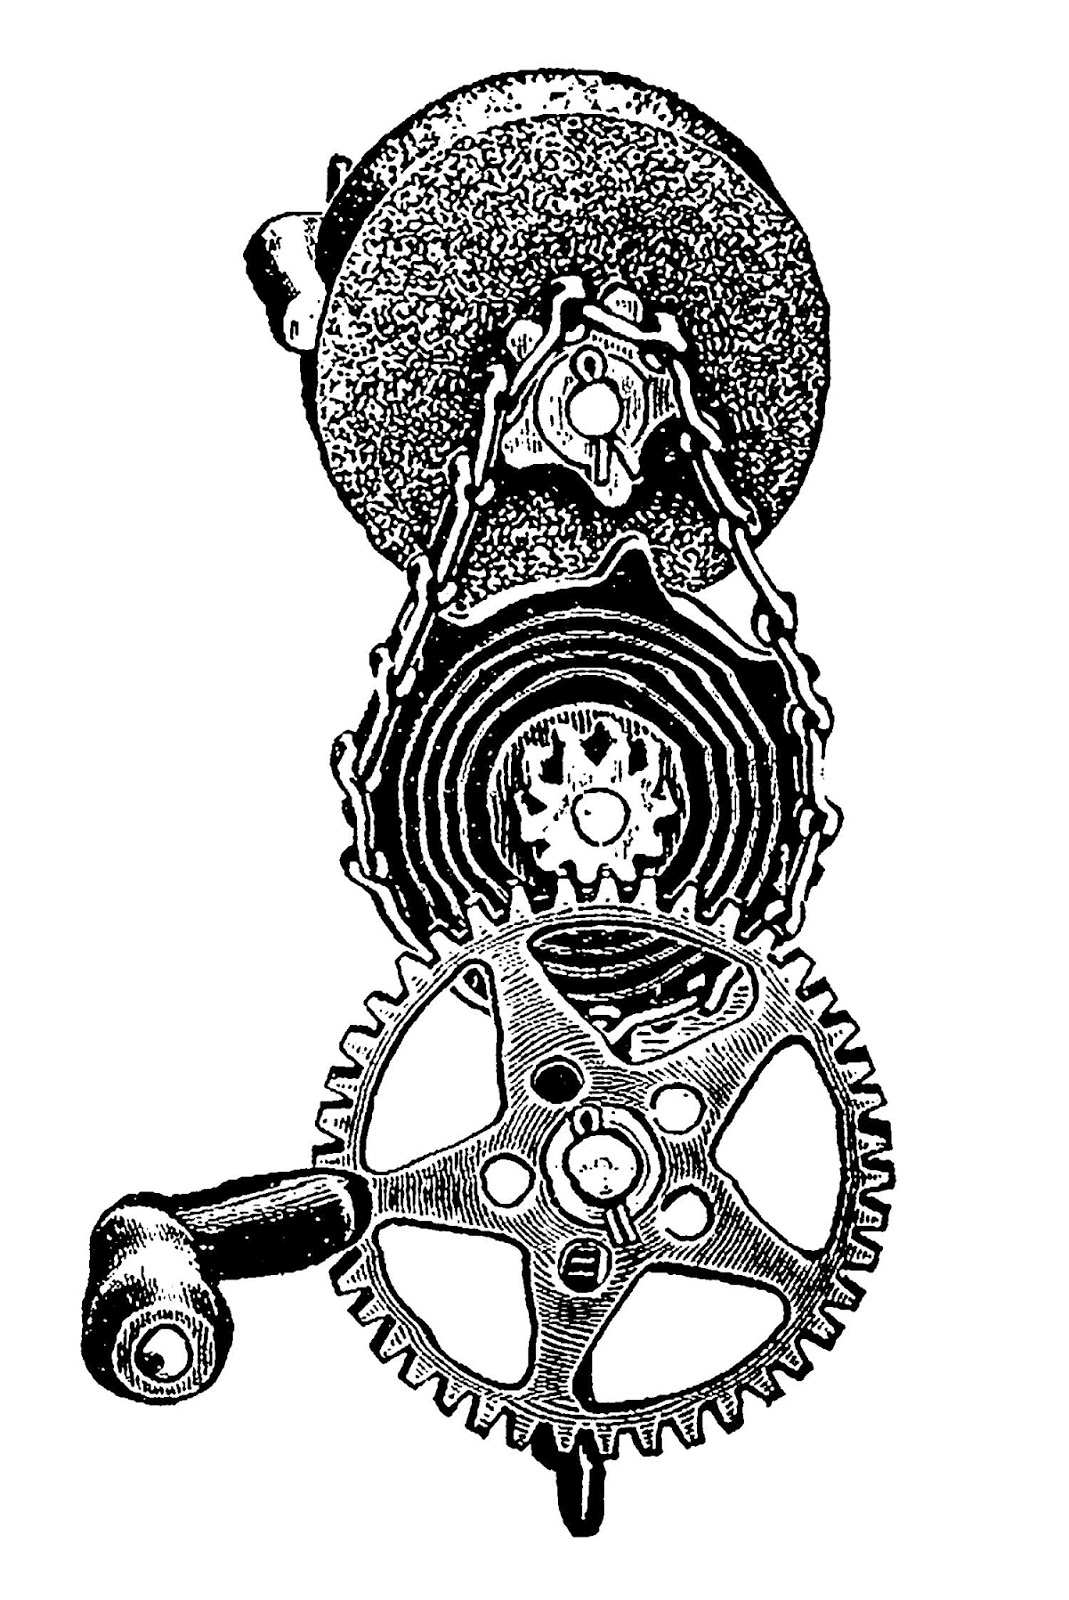 Gears clipart vintage steampunk Of Steampunk Gears Steampunk Digital